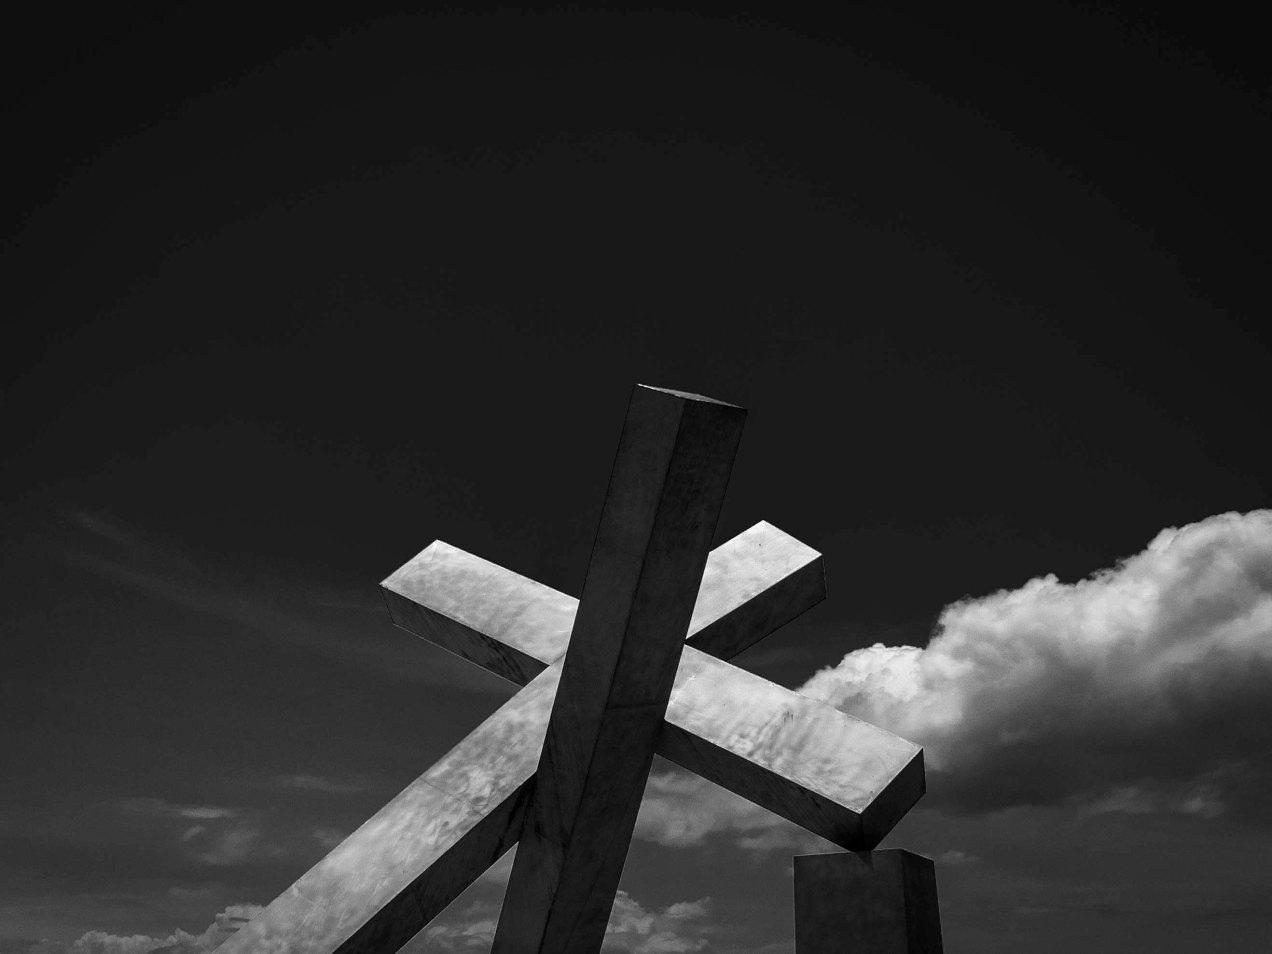 croix de salvador de bahia, gildaliere, Brésil, 2012